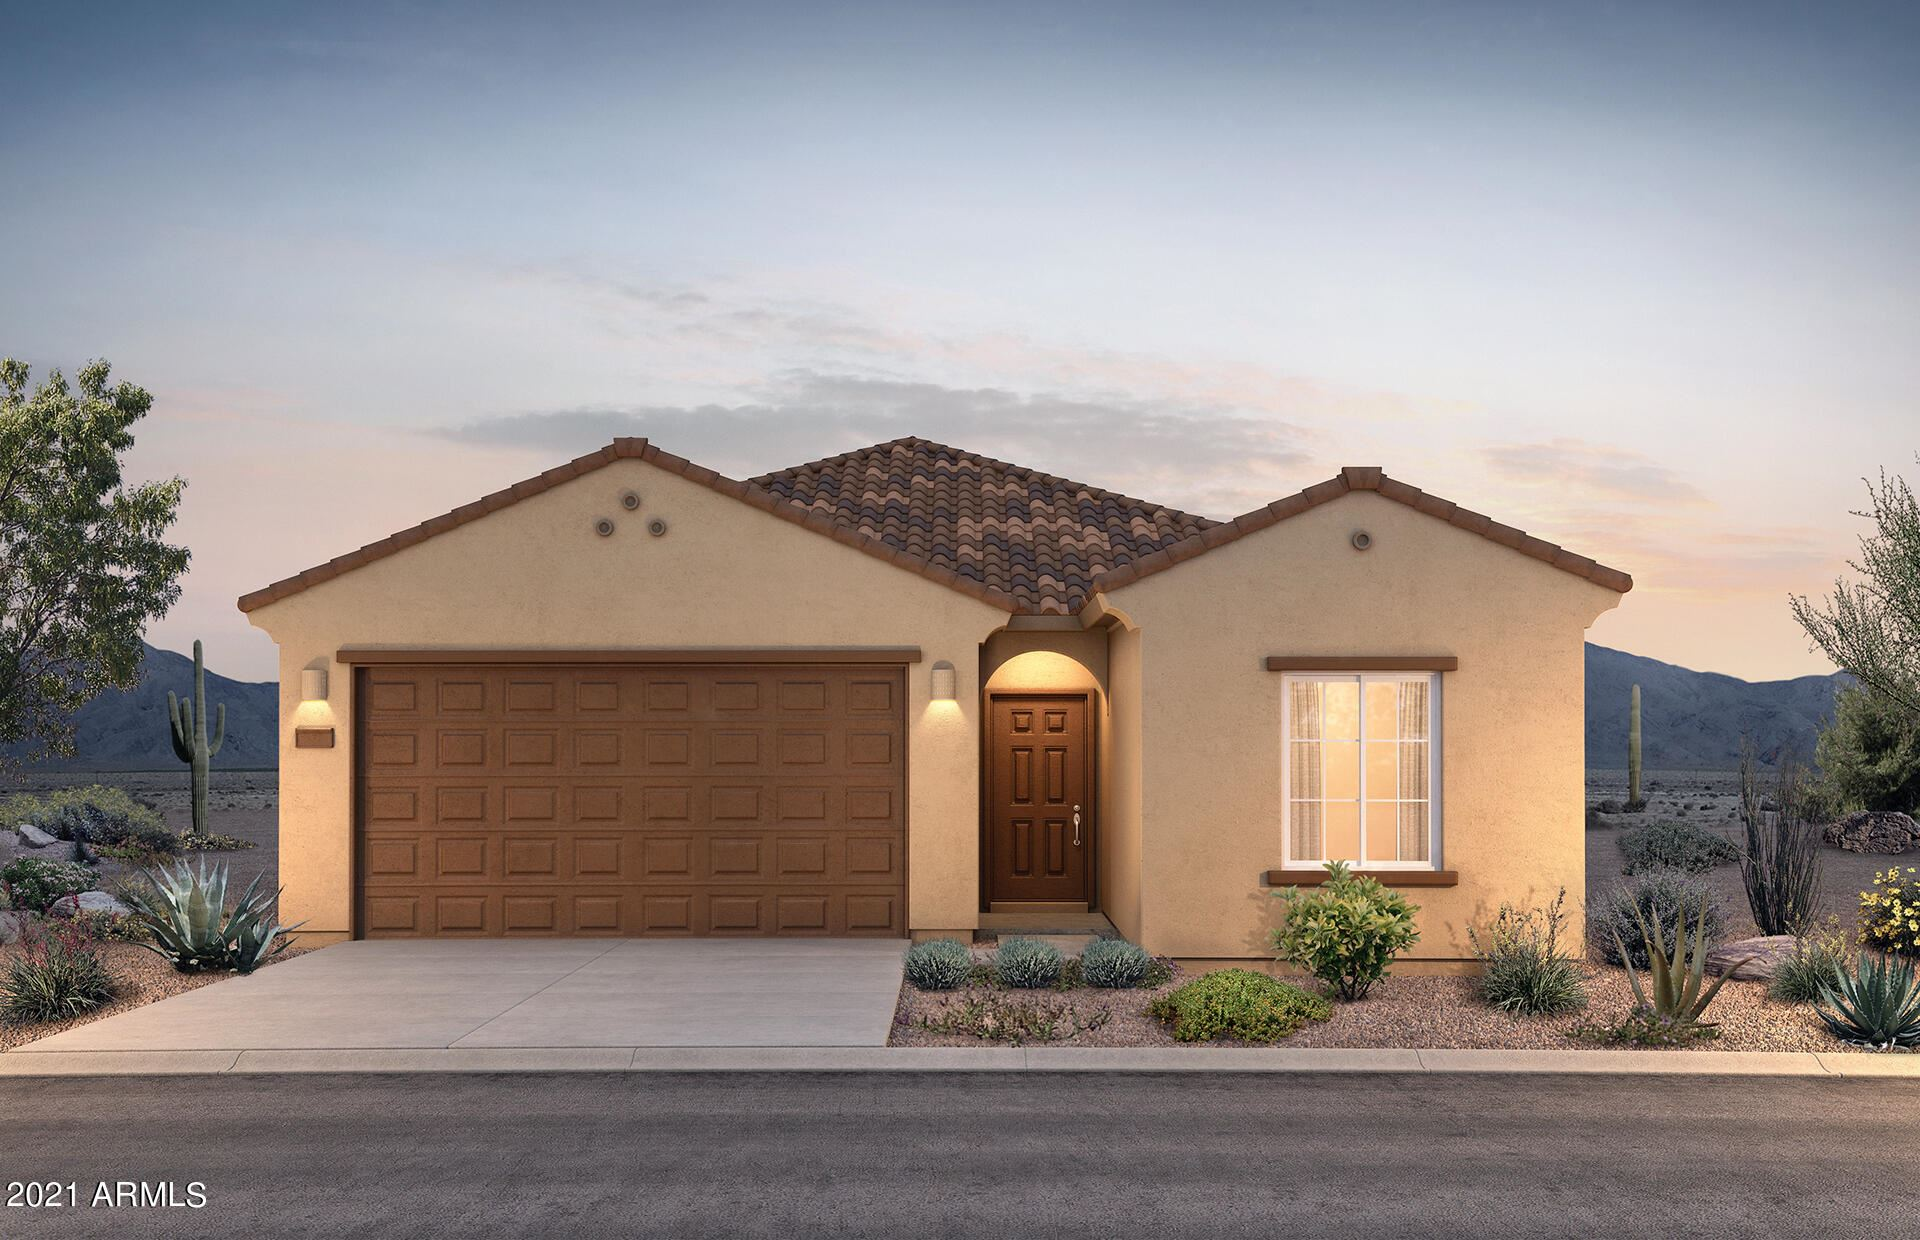 Photo for 43721 W ACACIA Avenue, Maricopa, AZ 85138 (MLS # 6257506)